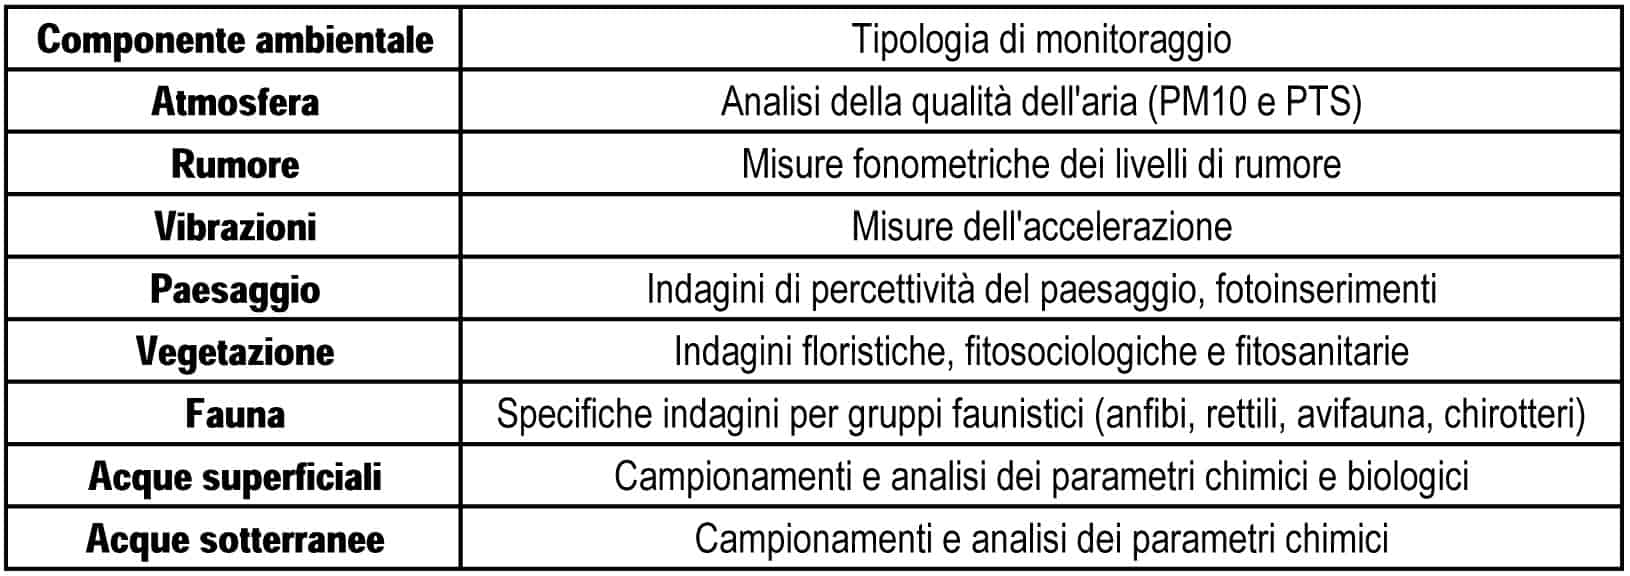 Le matrici ambientali indagate e le tipologie di indagine (PMA della TEEM)